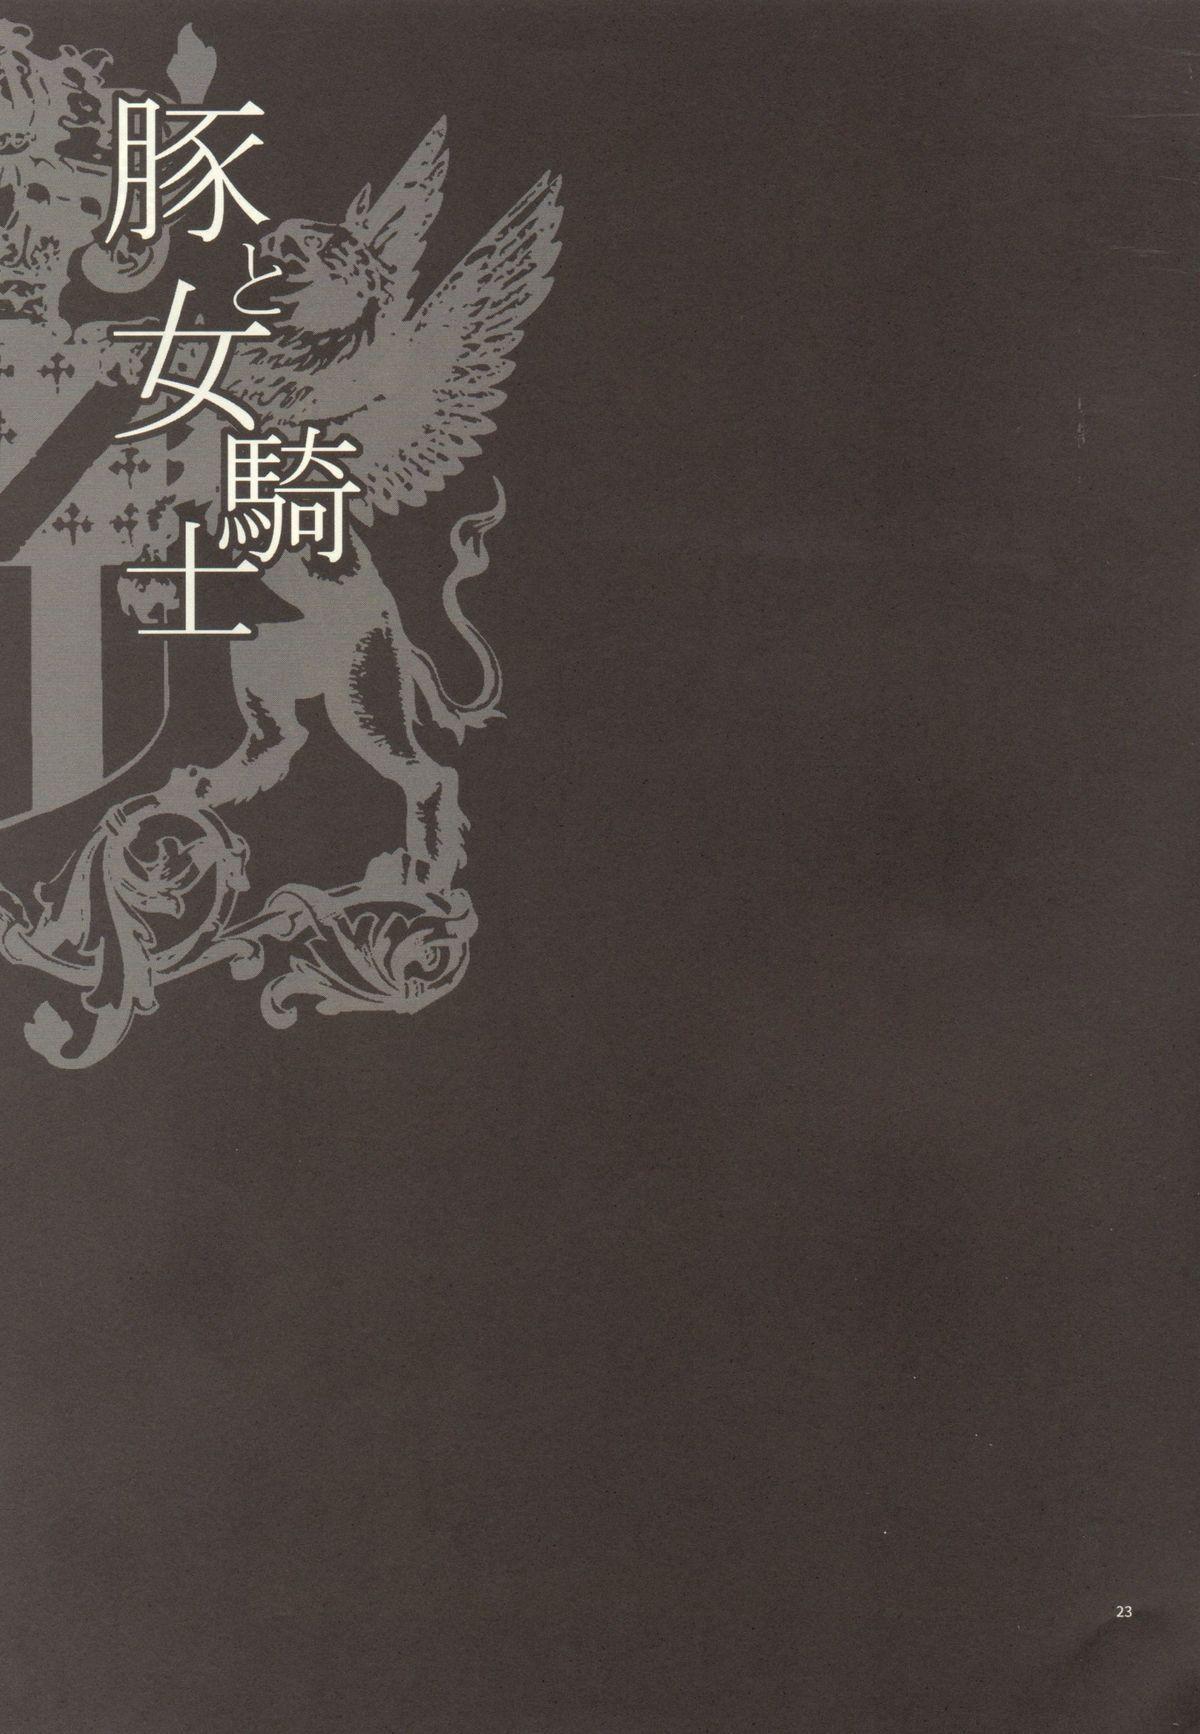 Yukiyanagi no Hon 37 Buta to Onnakishi - Lady knight in love with Orc 21